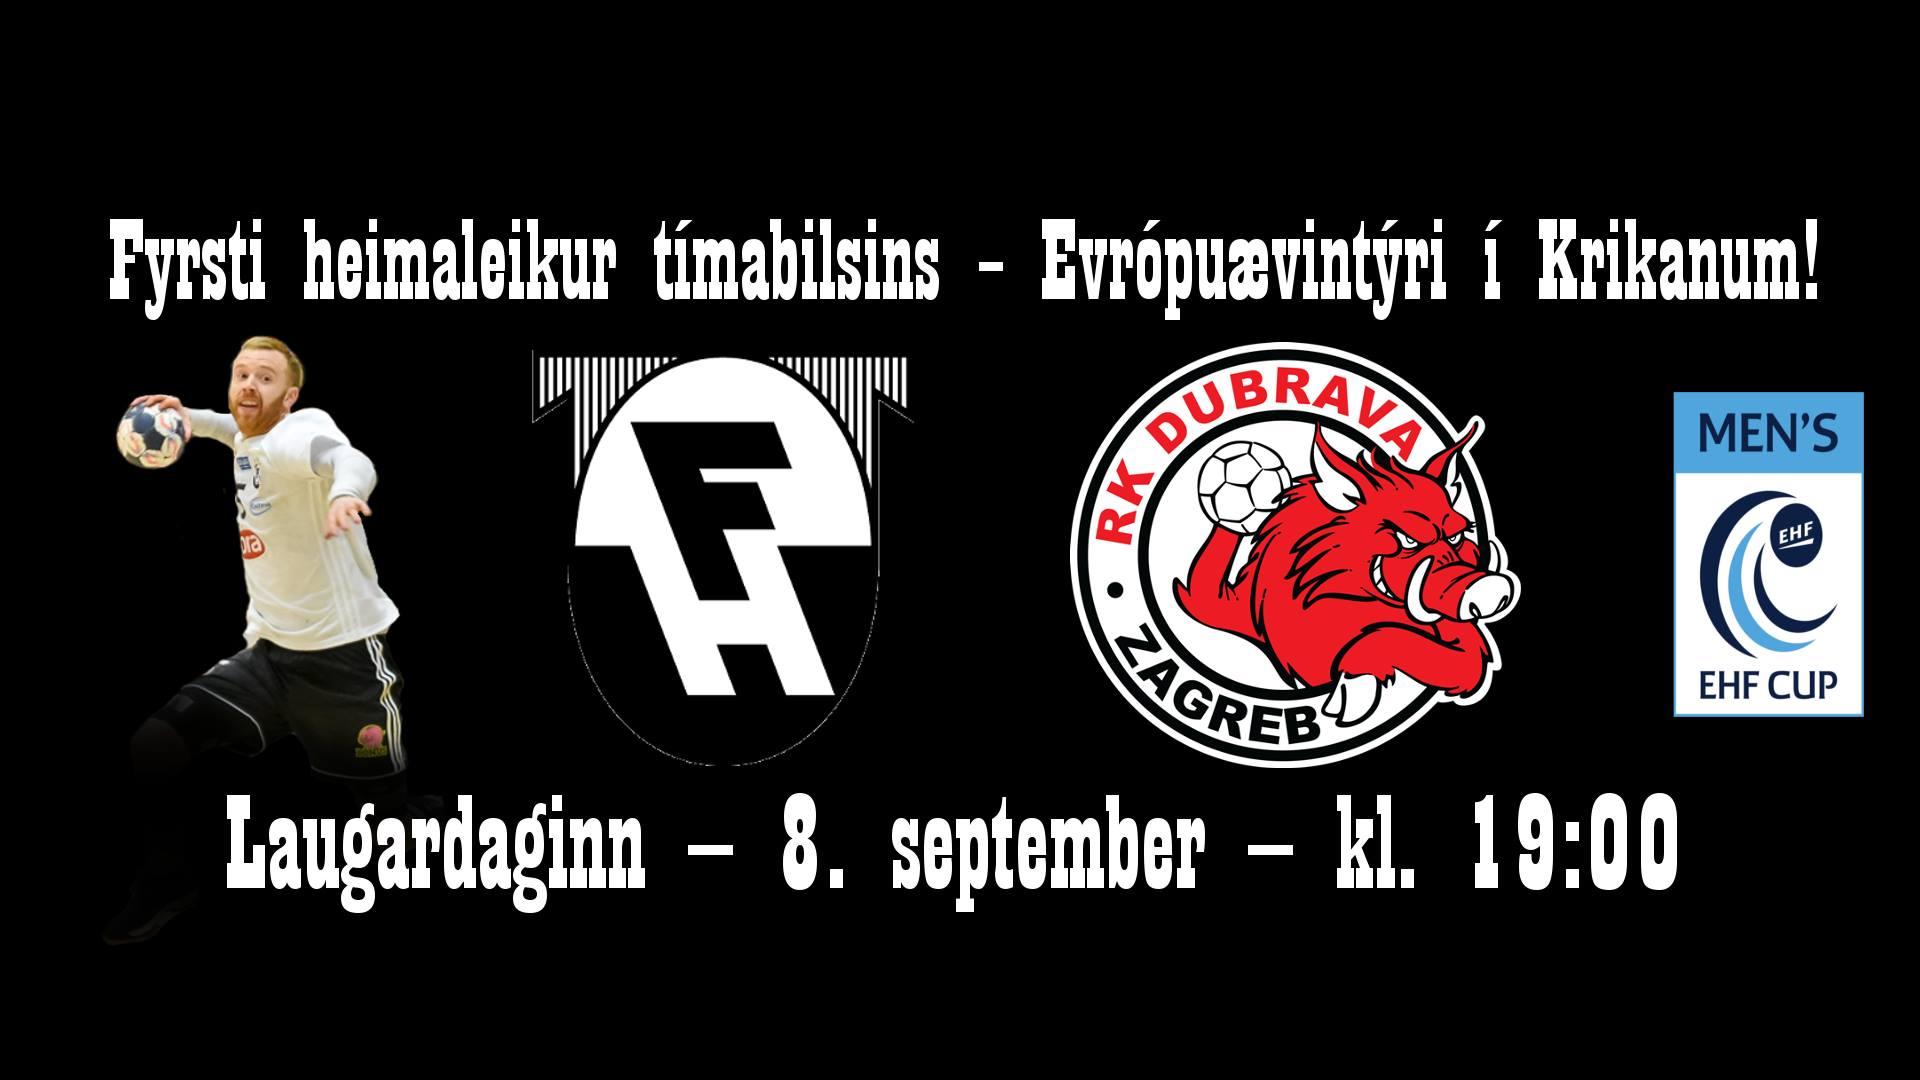 EHF Cup : VEPROVI LOVE ZAOSTATAK OD -4